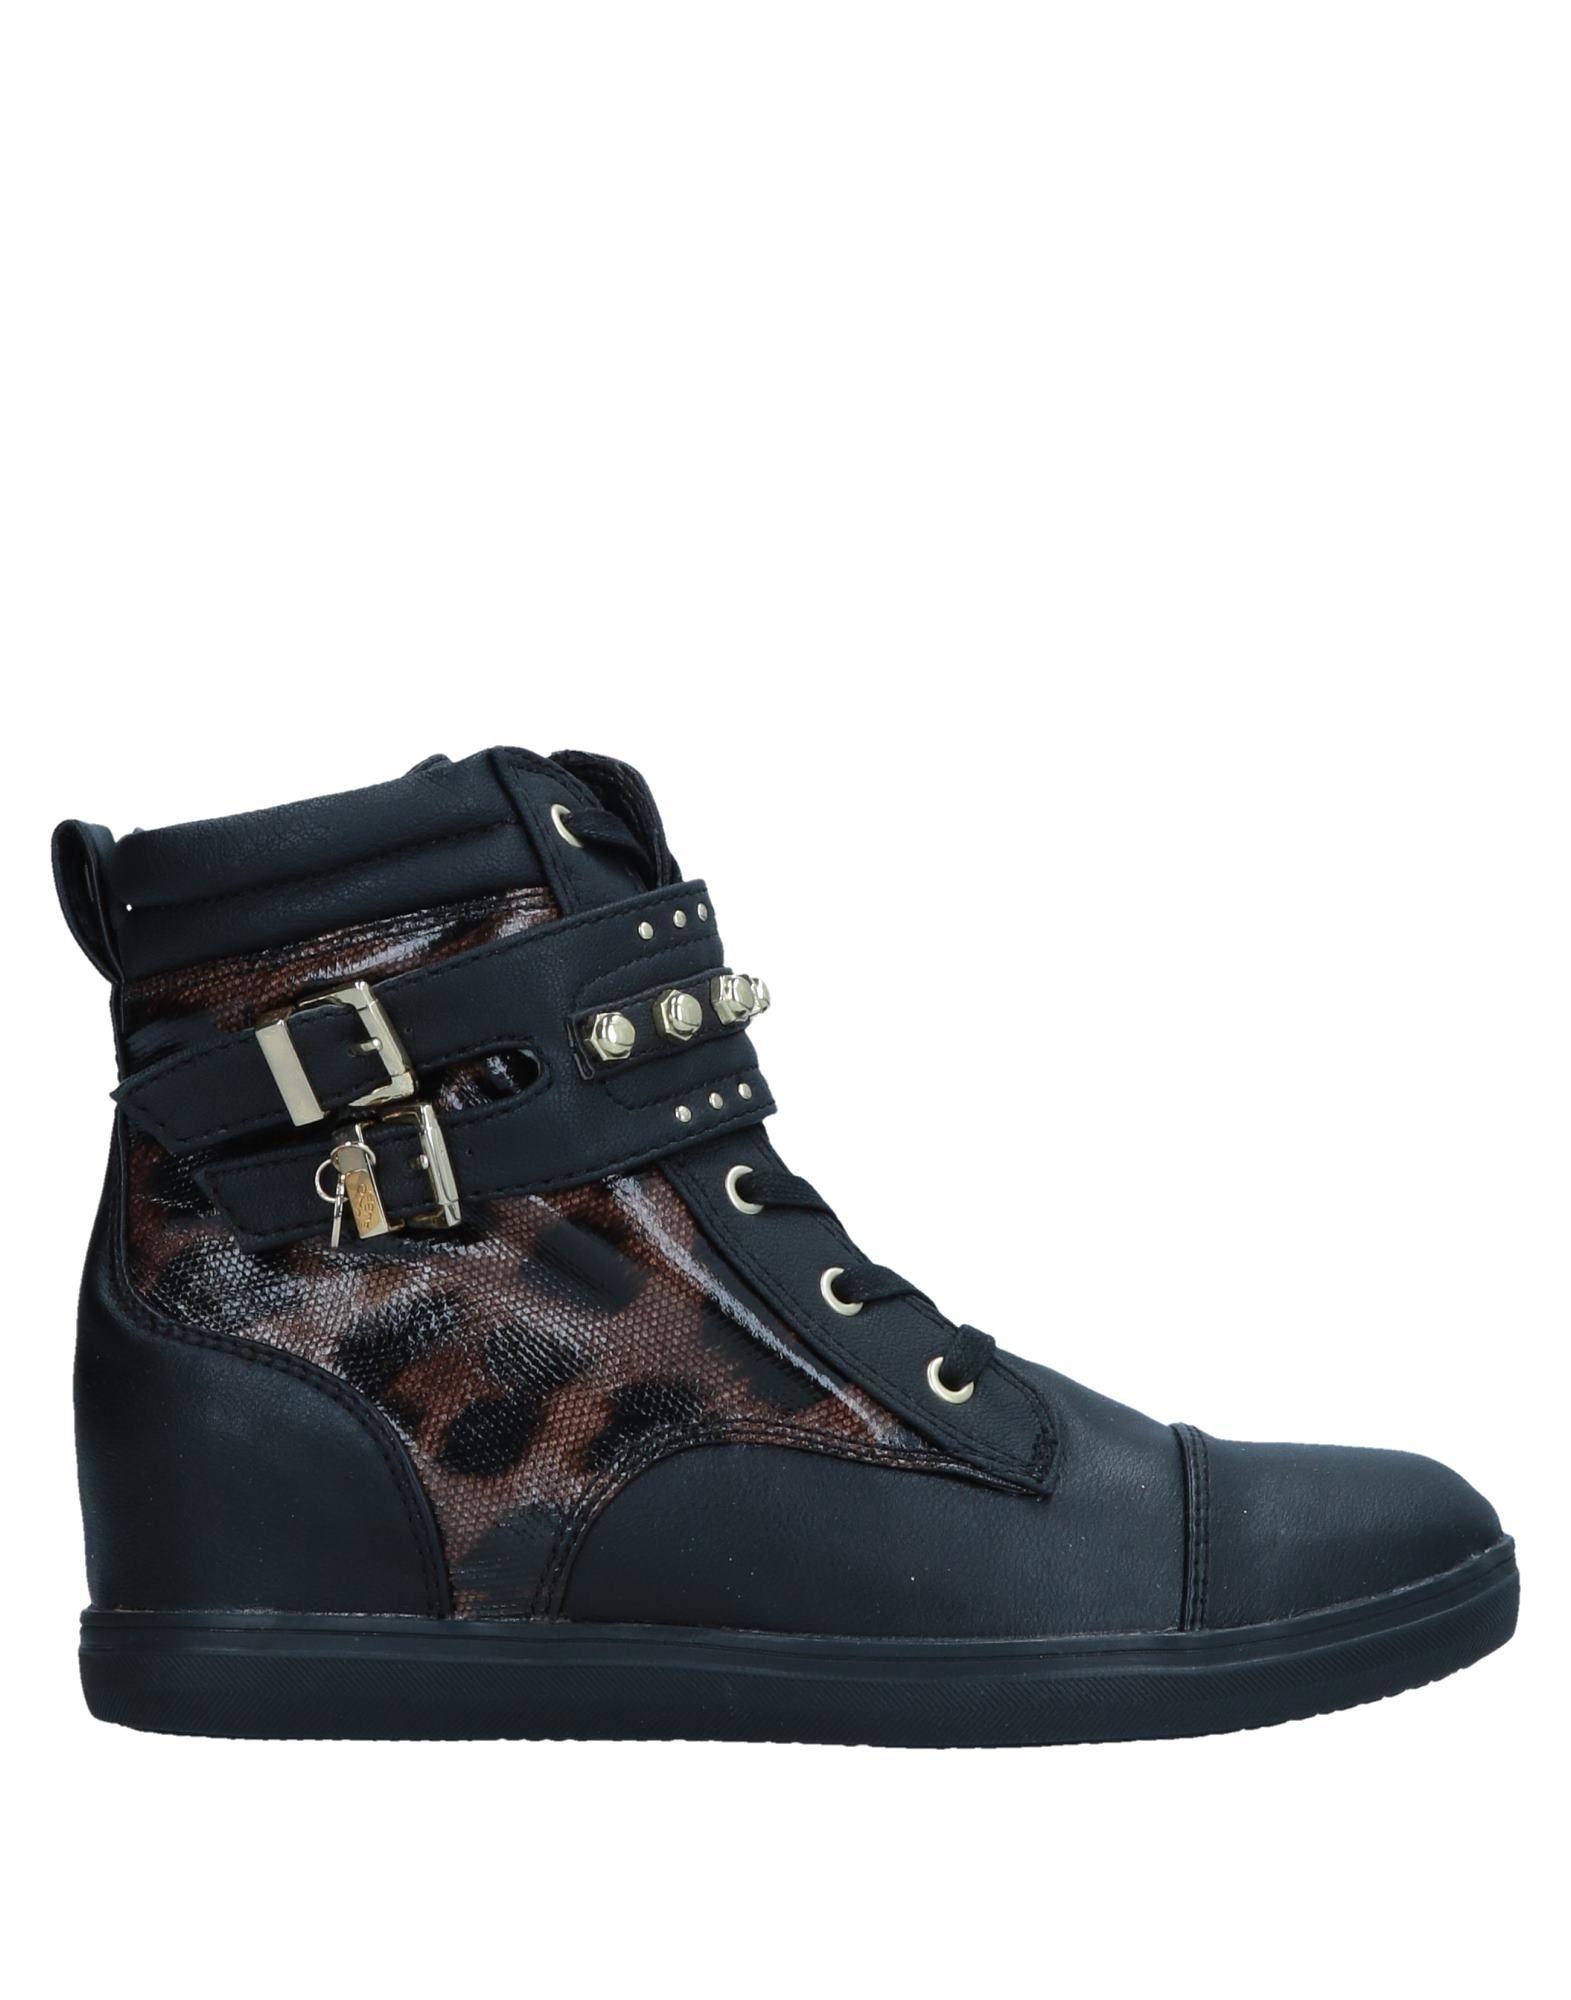 Sneakers Scarpe Gaudì Donna - 11554812GU Scarpe Sneakers comode e distintive 5d8327